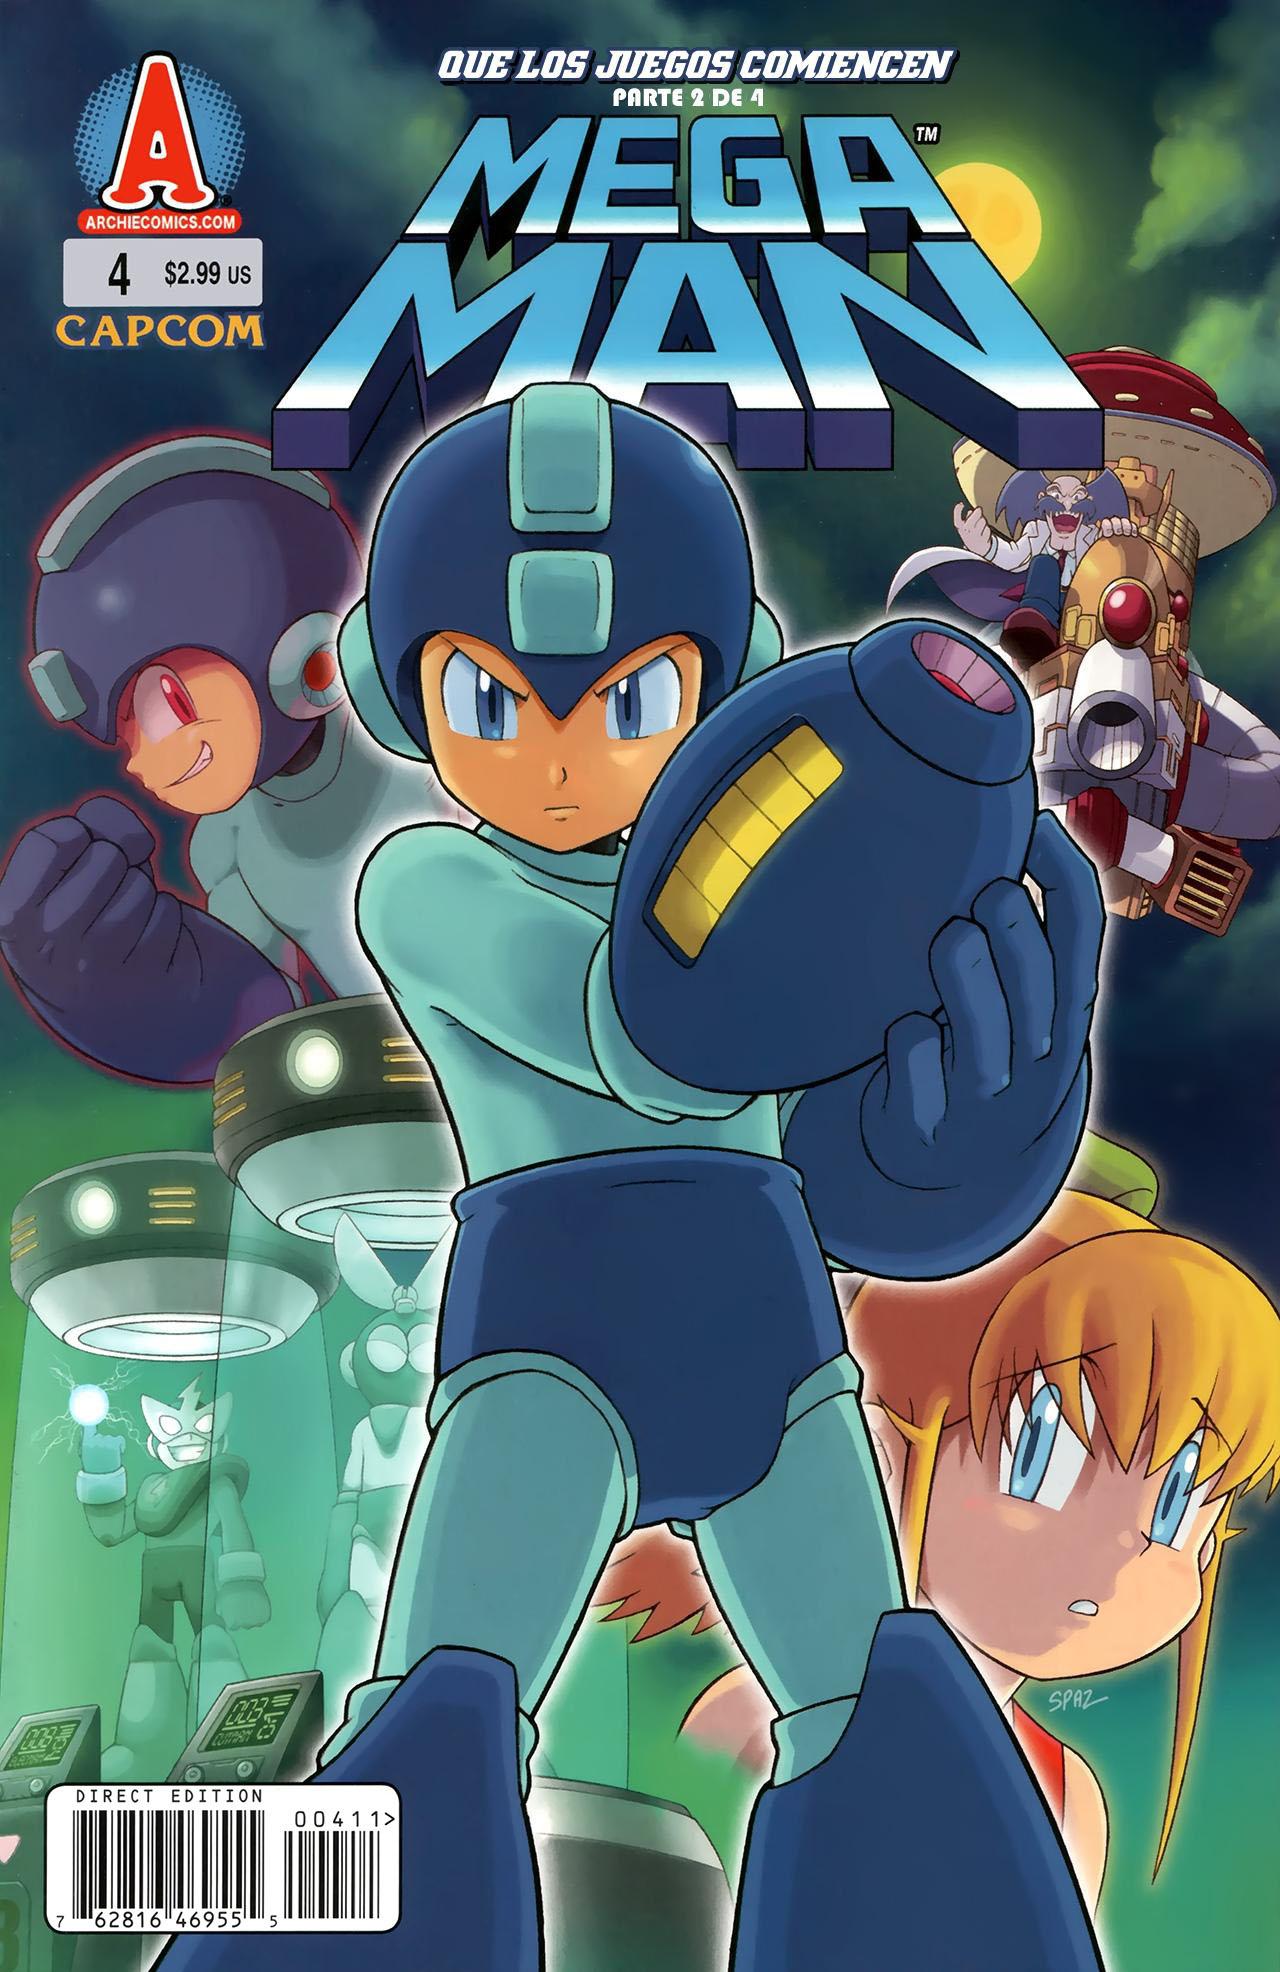 Mega man no 004 mega man hq fandom powered by wikia - Megaman wikia ...